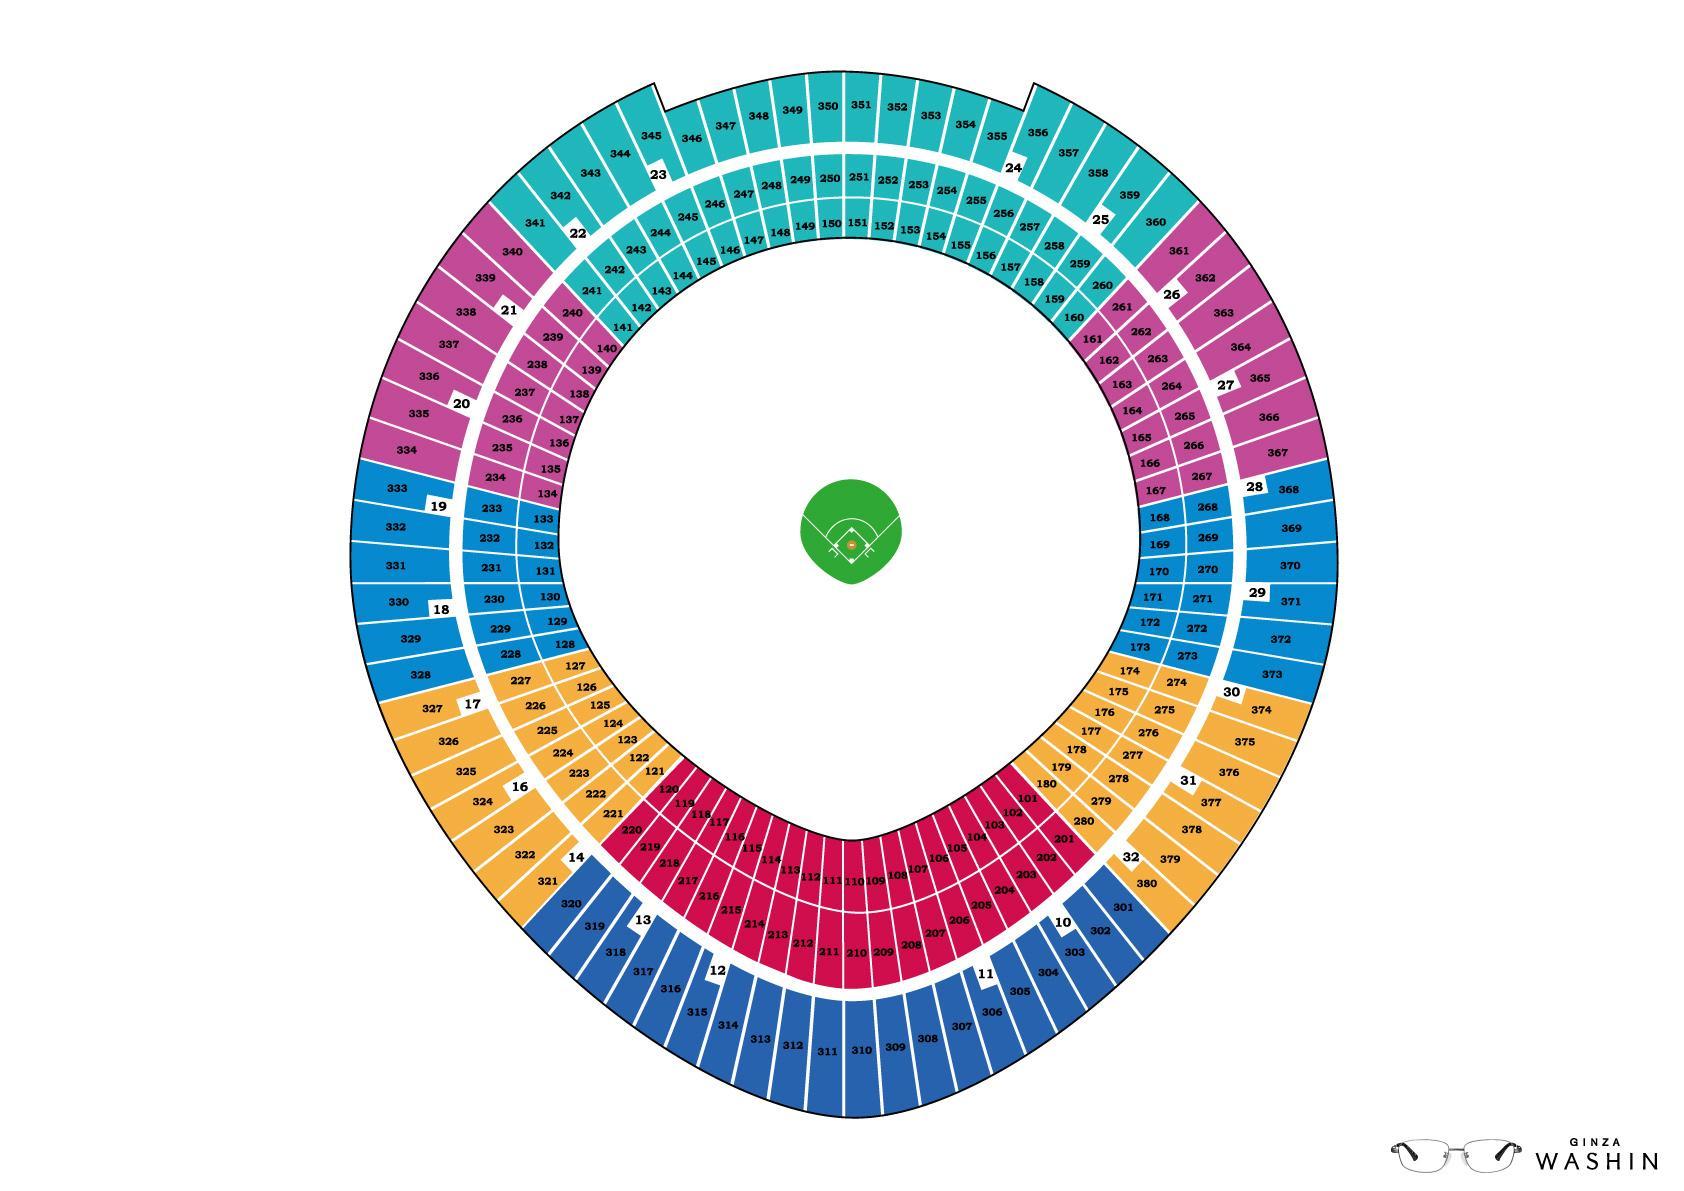 Washin Optical Print Ad -  Baseball stadium seating chart